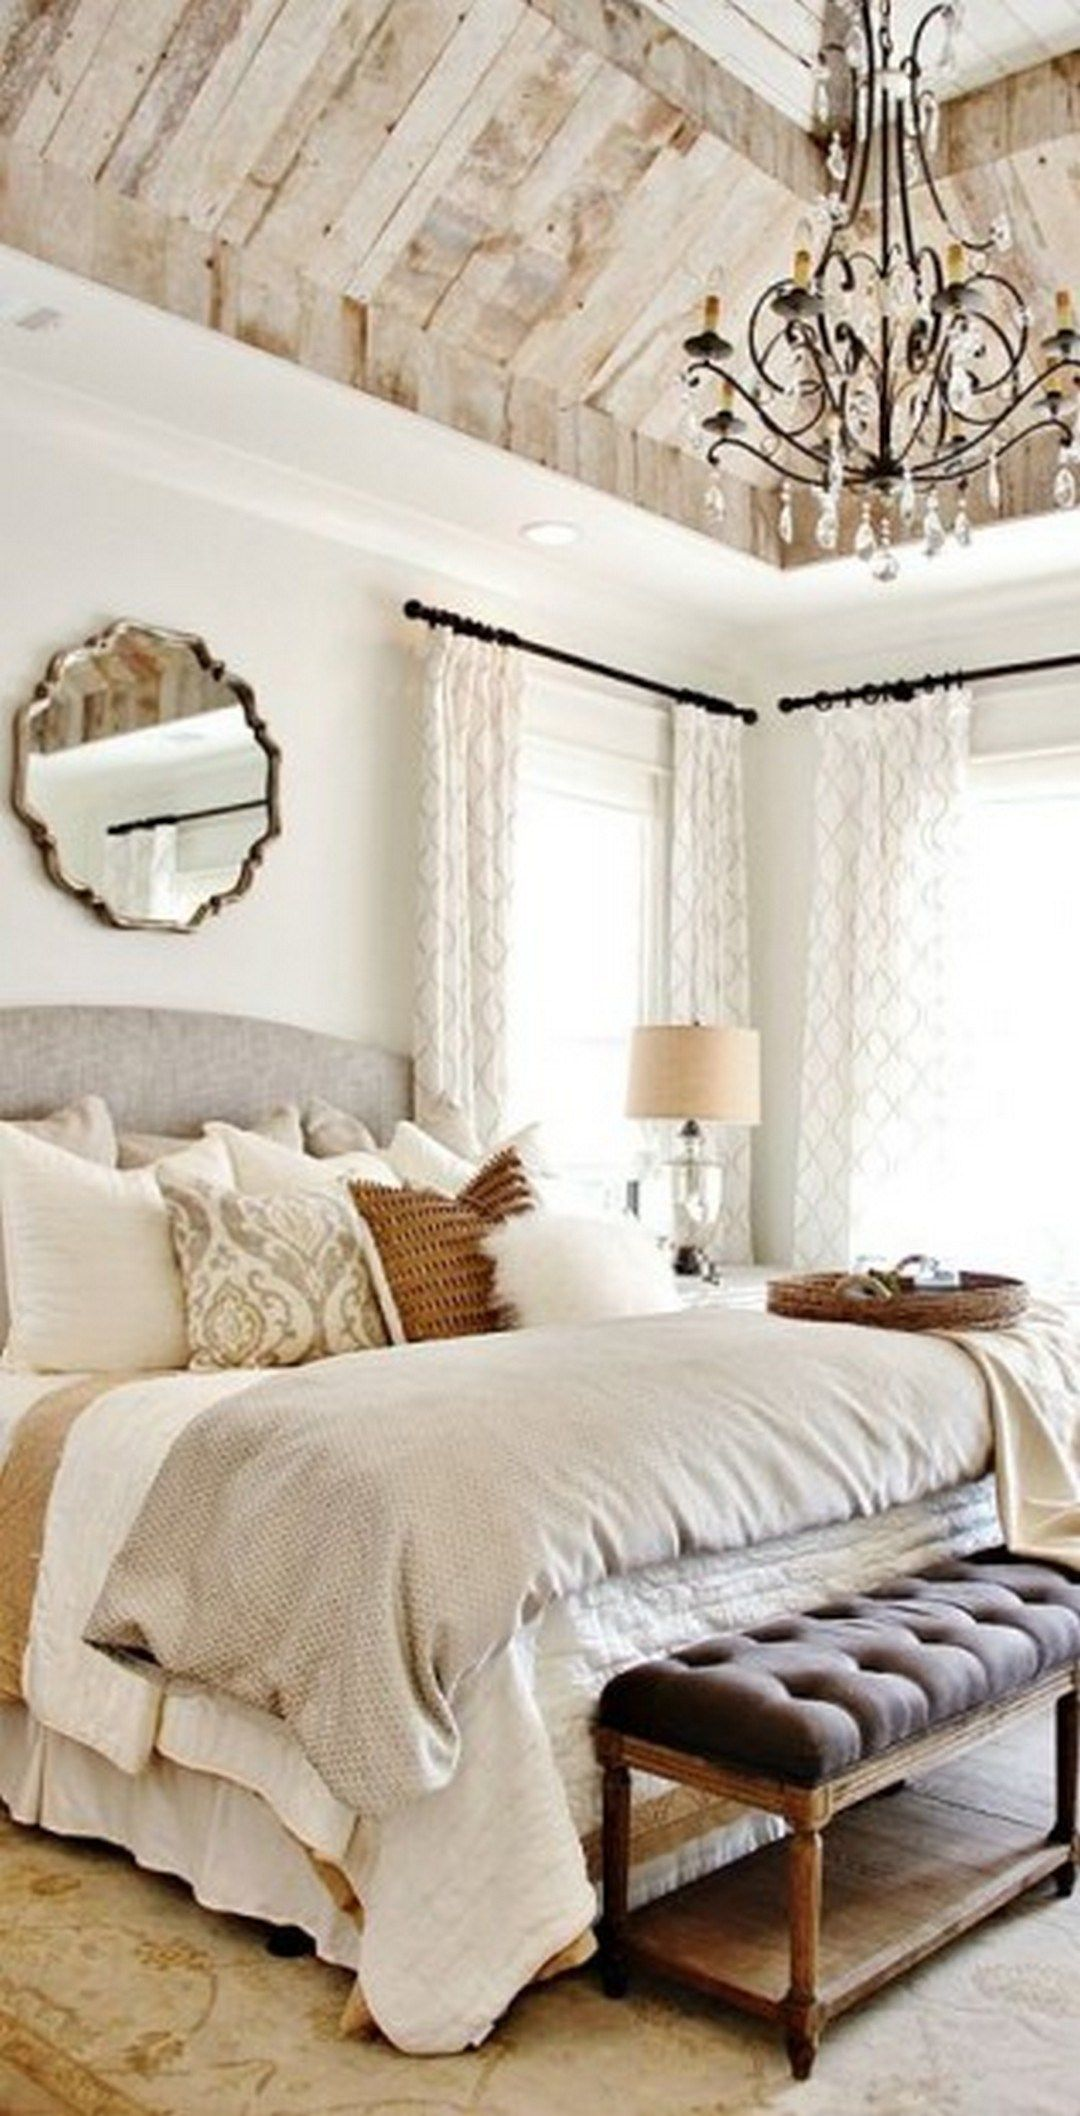 Master bedroom decorating ideas   Beautiful Master Bedroom Decorating Ideas   Master bedrooms